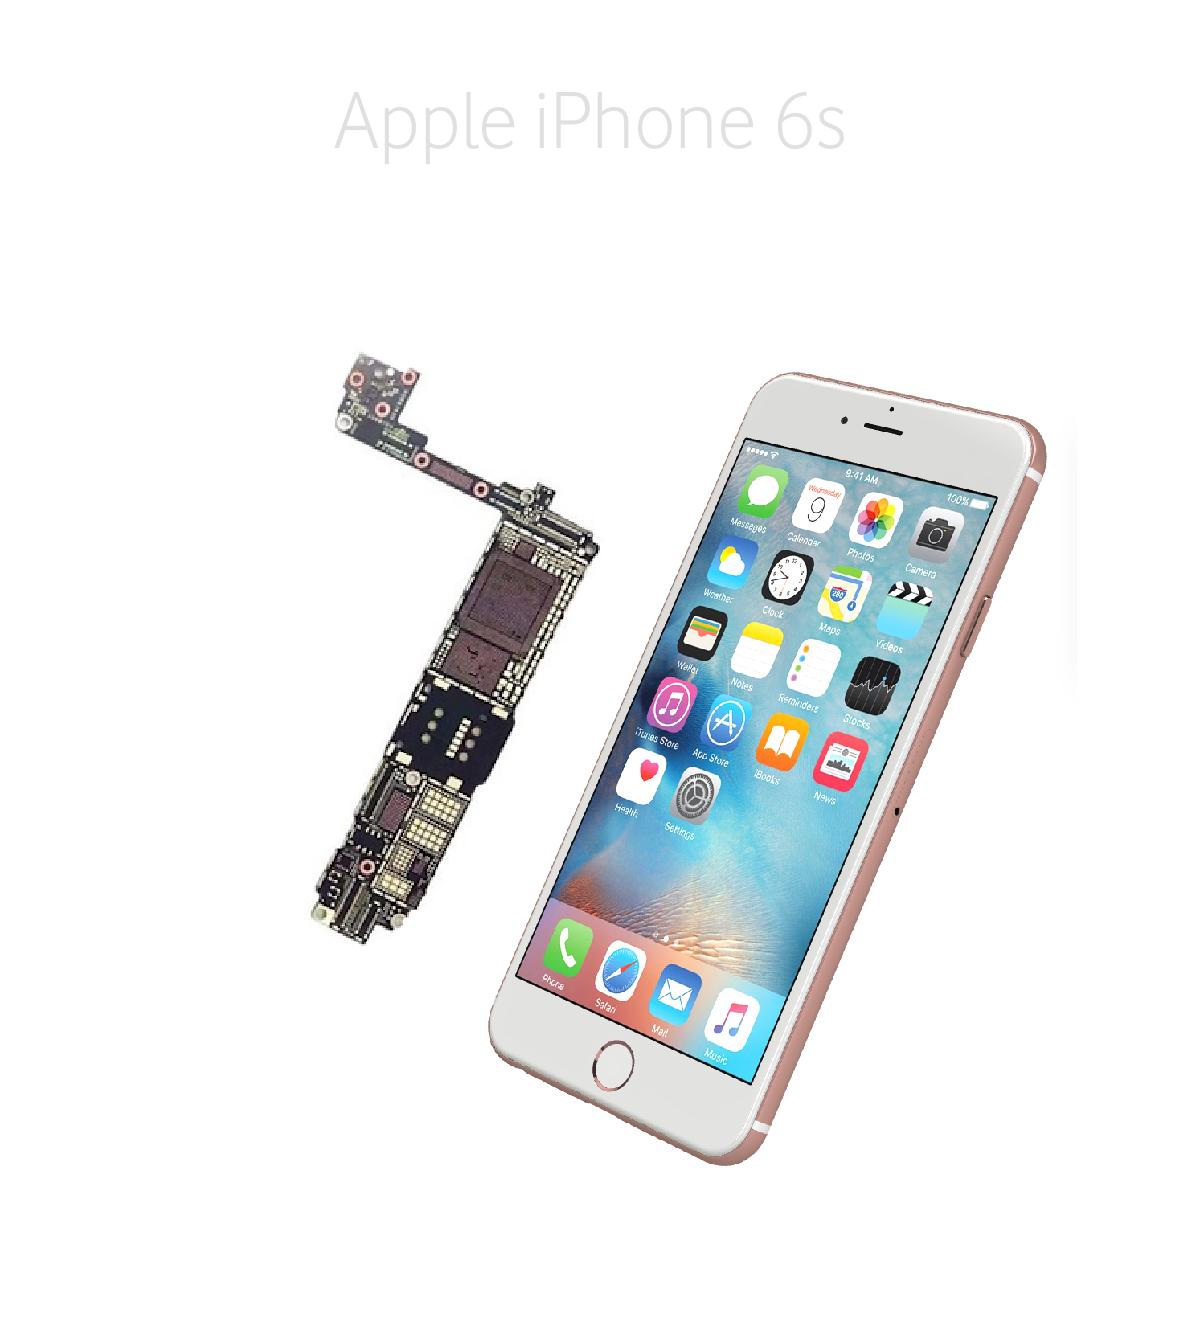 Avancerad lödning iPhone 6s